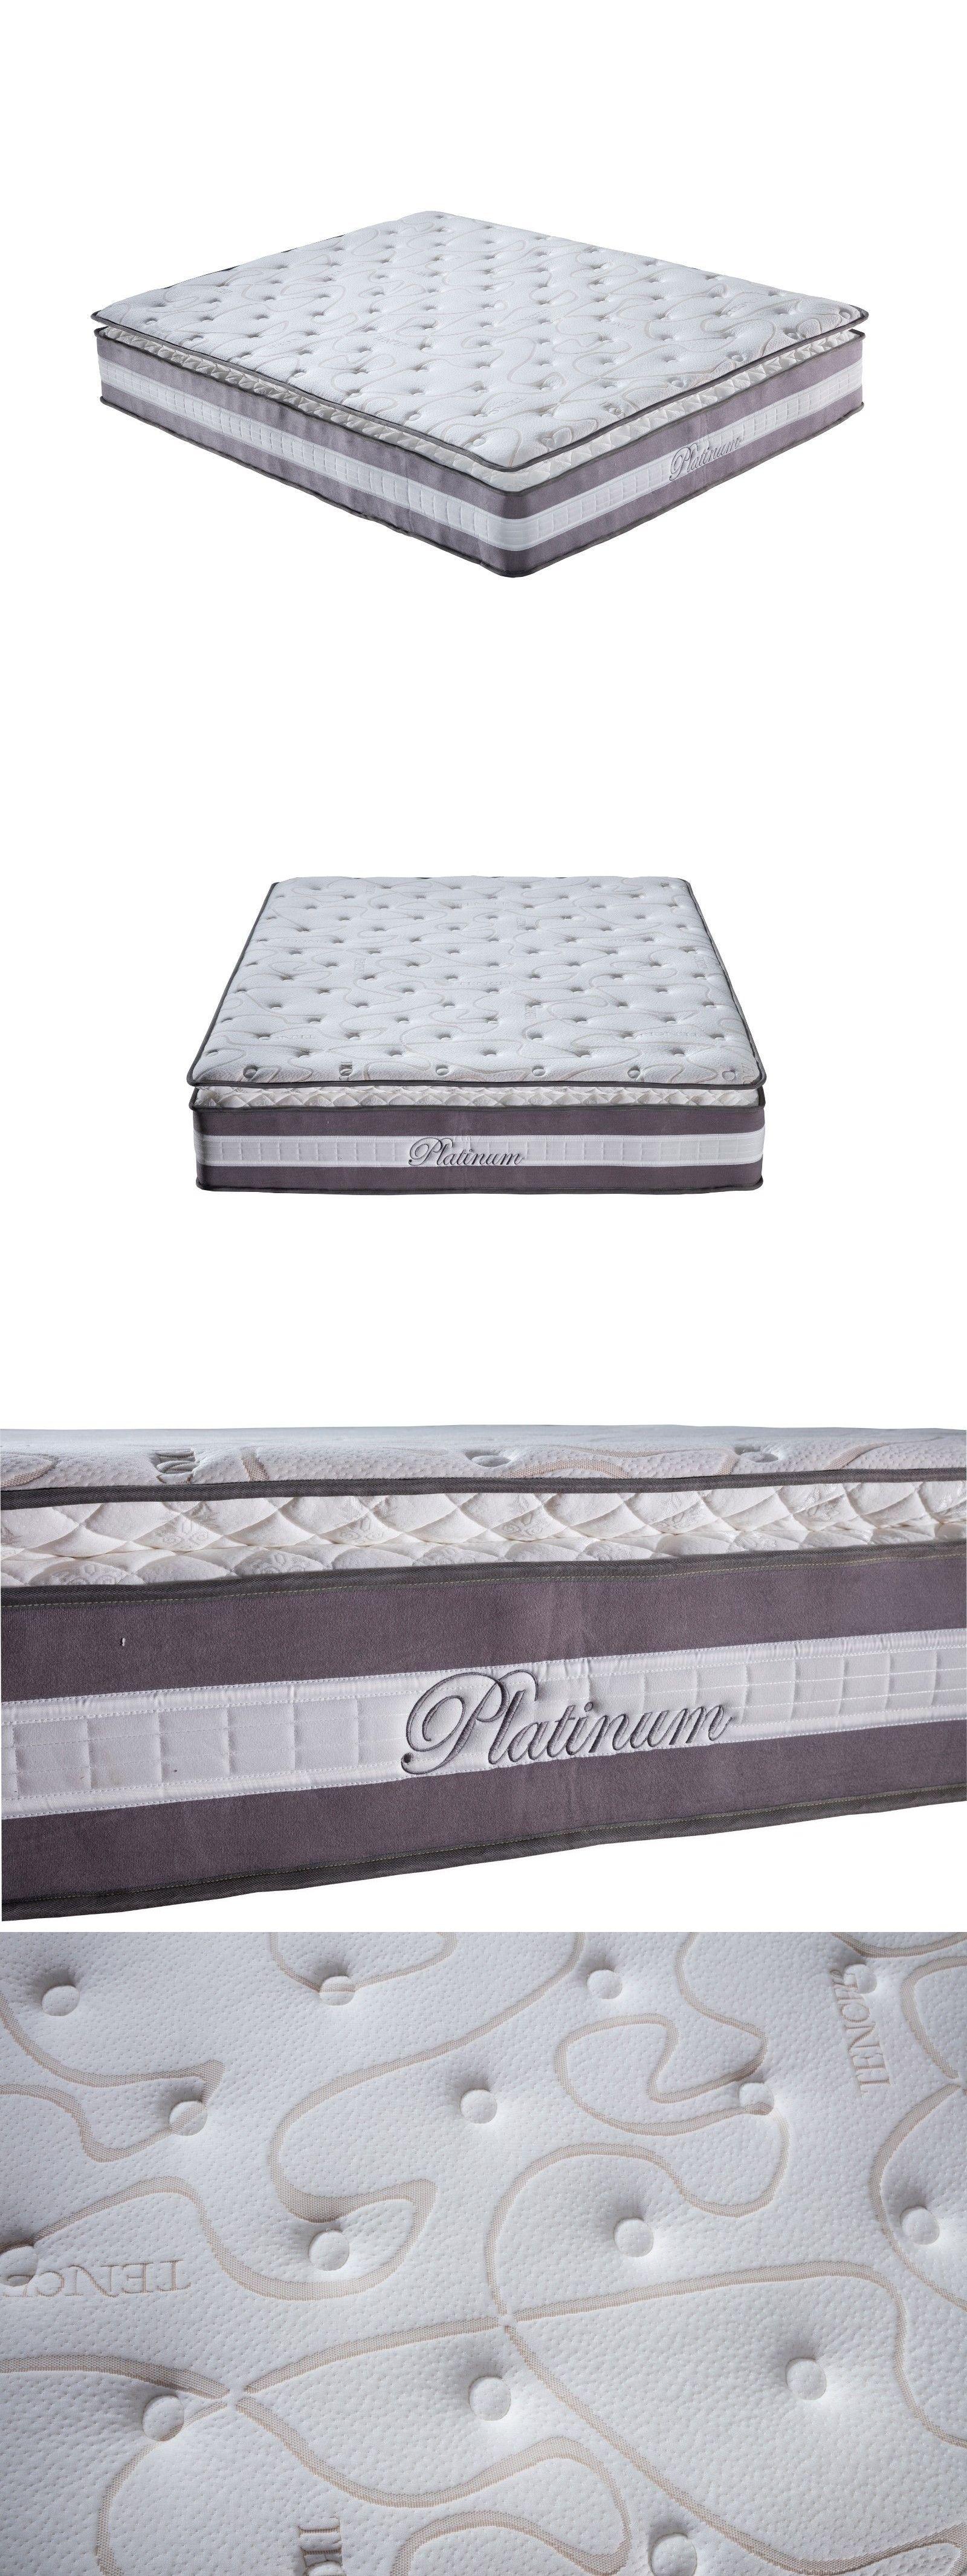 bedding high density 13 plush pillow top hybrid memory foam and spring mattress queen